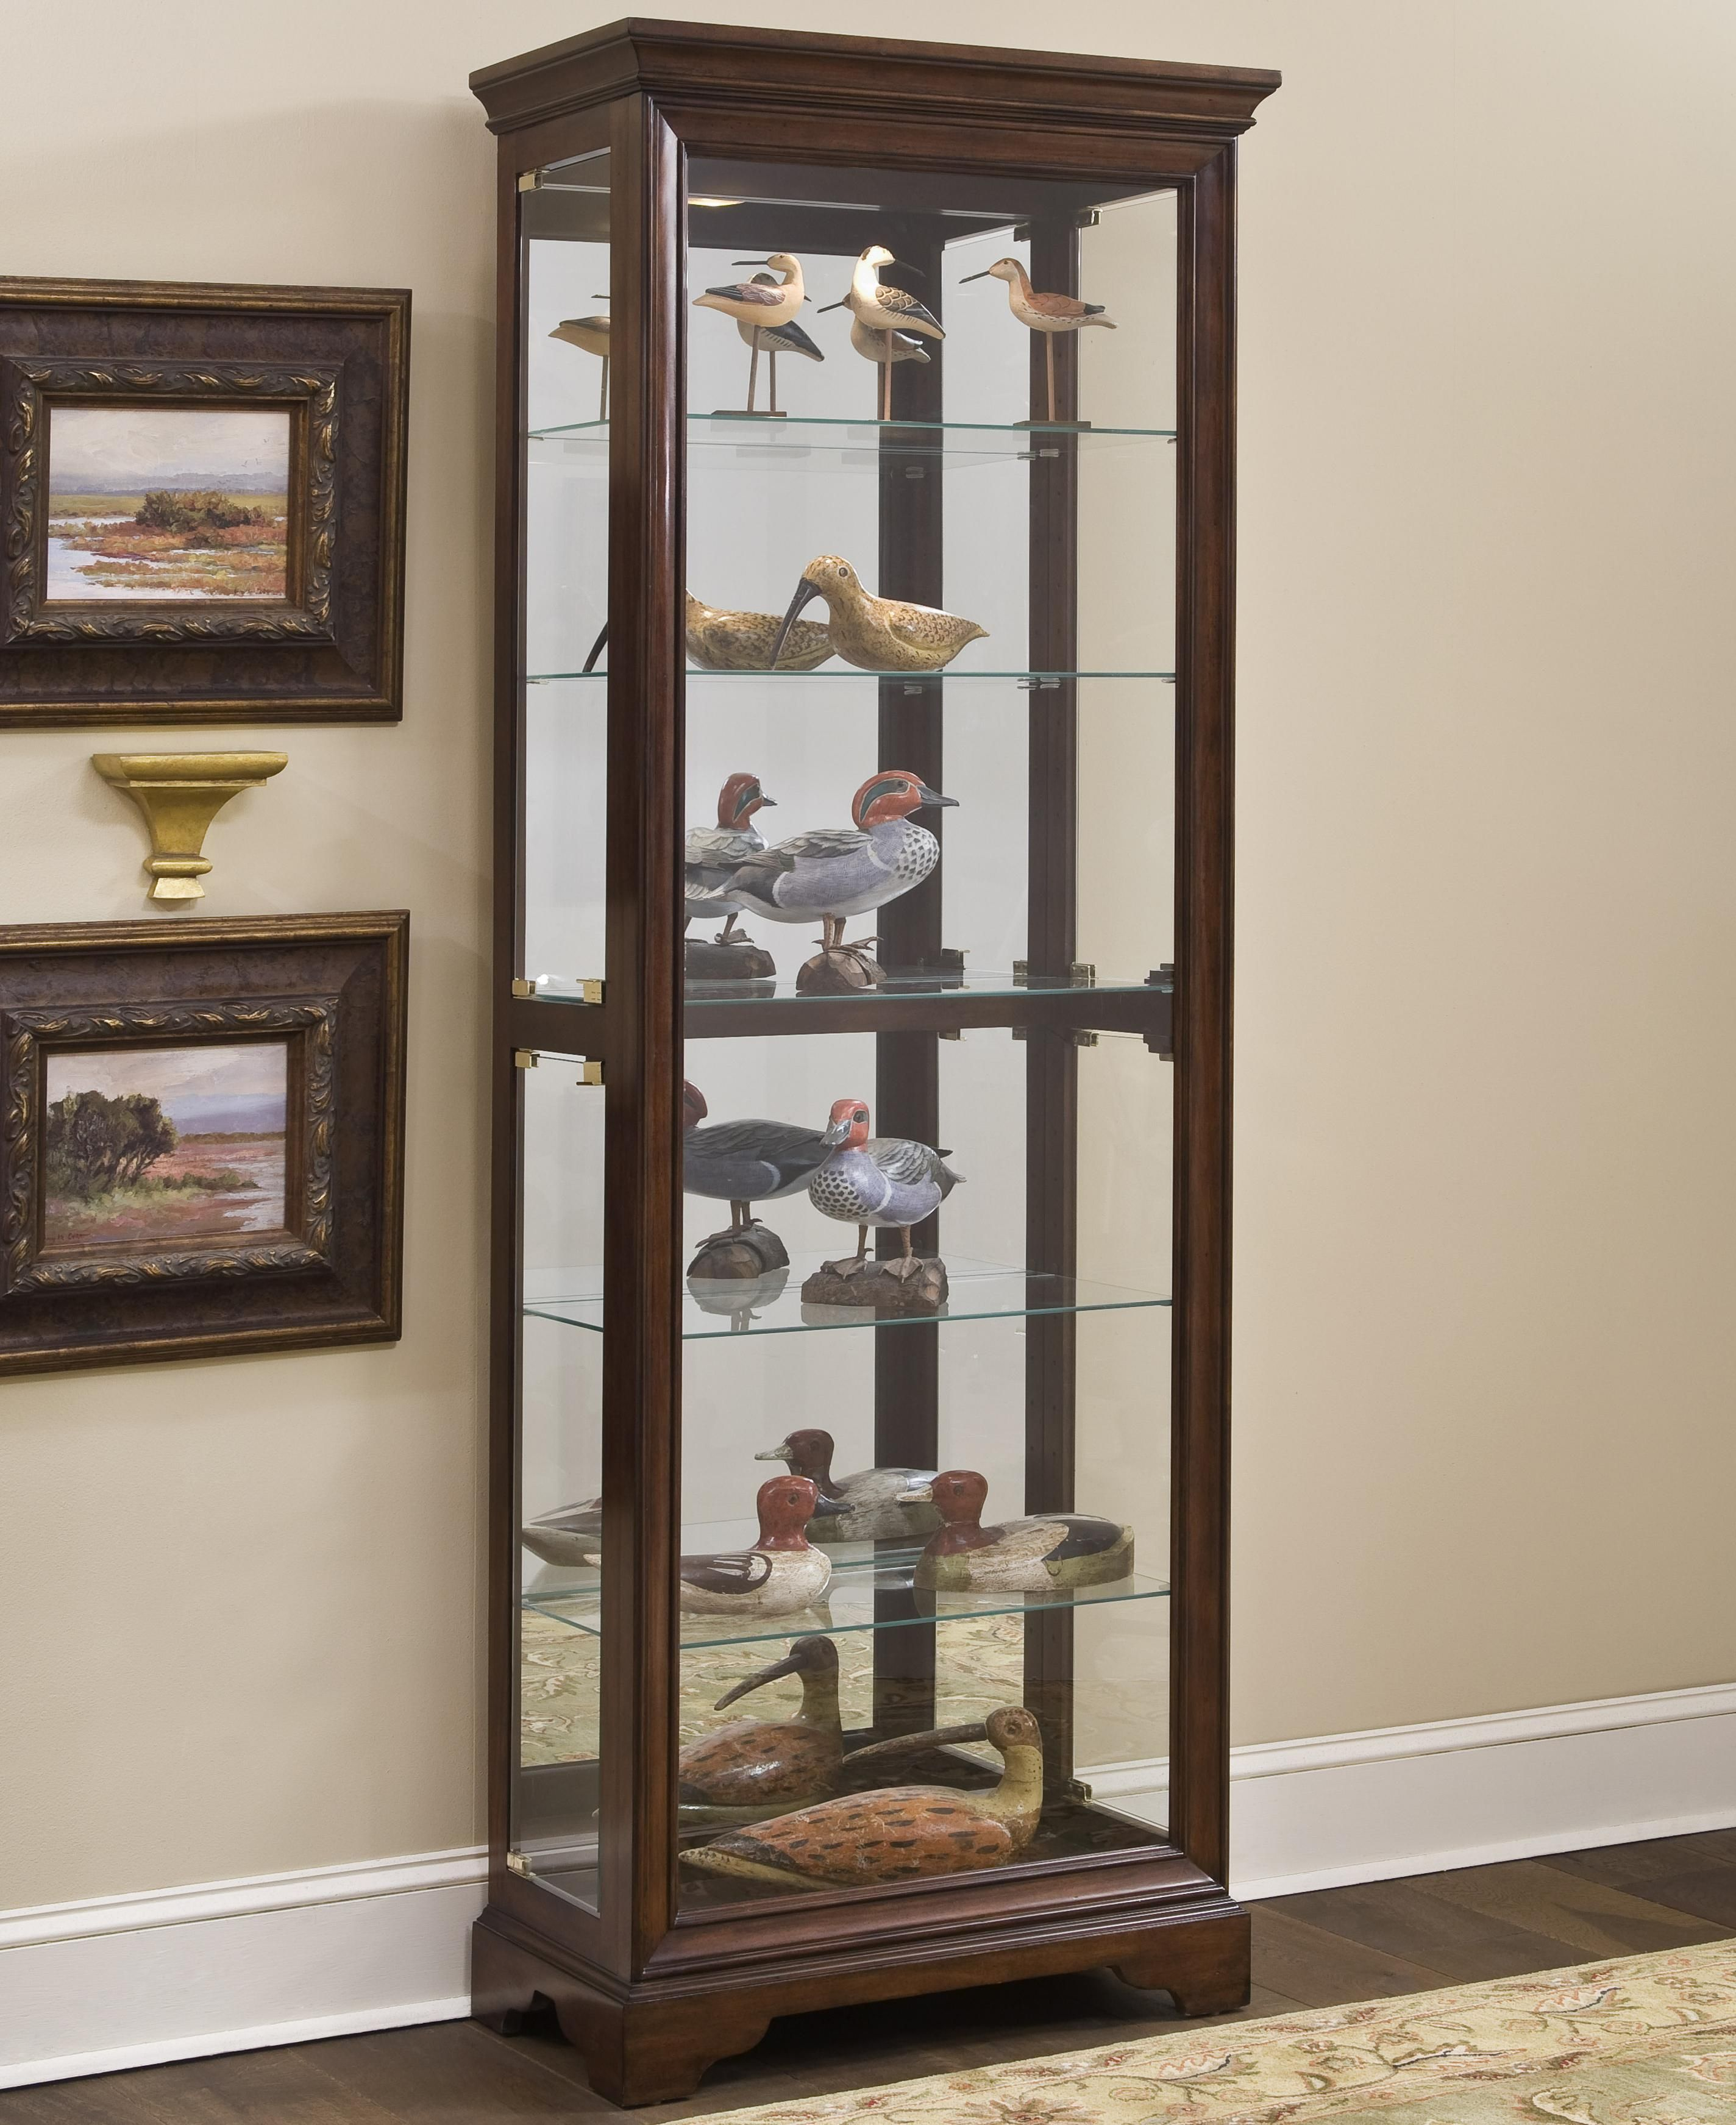 Curios Gallery Curio Cabinet By Pulaski Furniture Pulaski